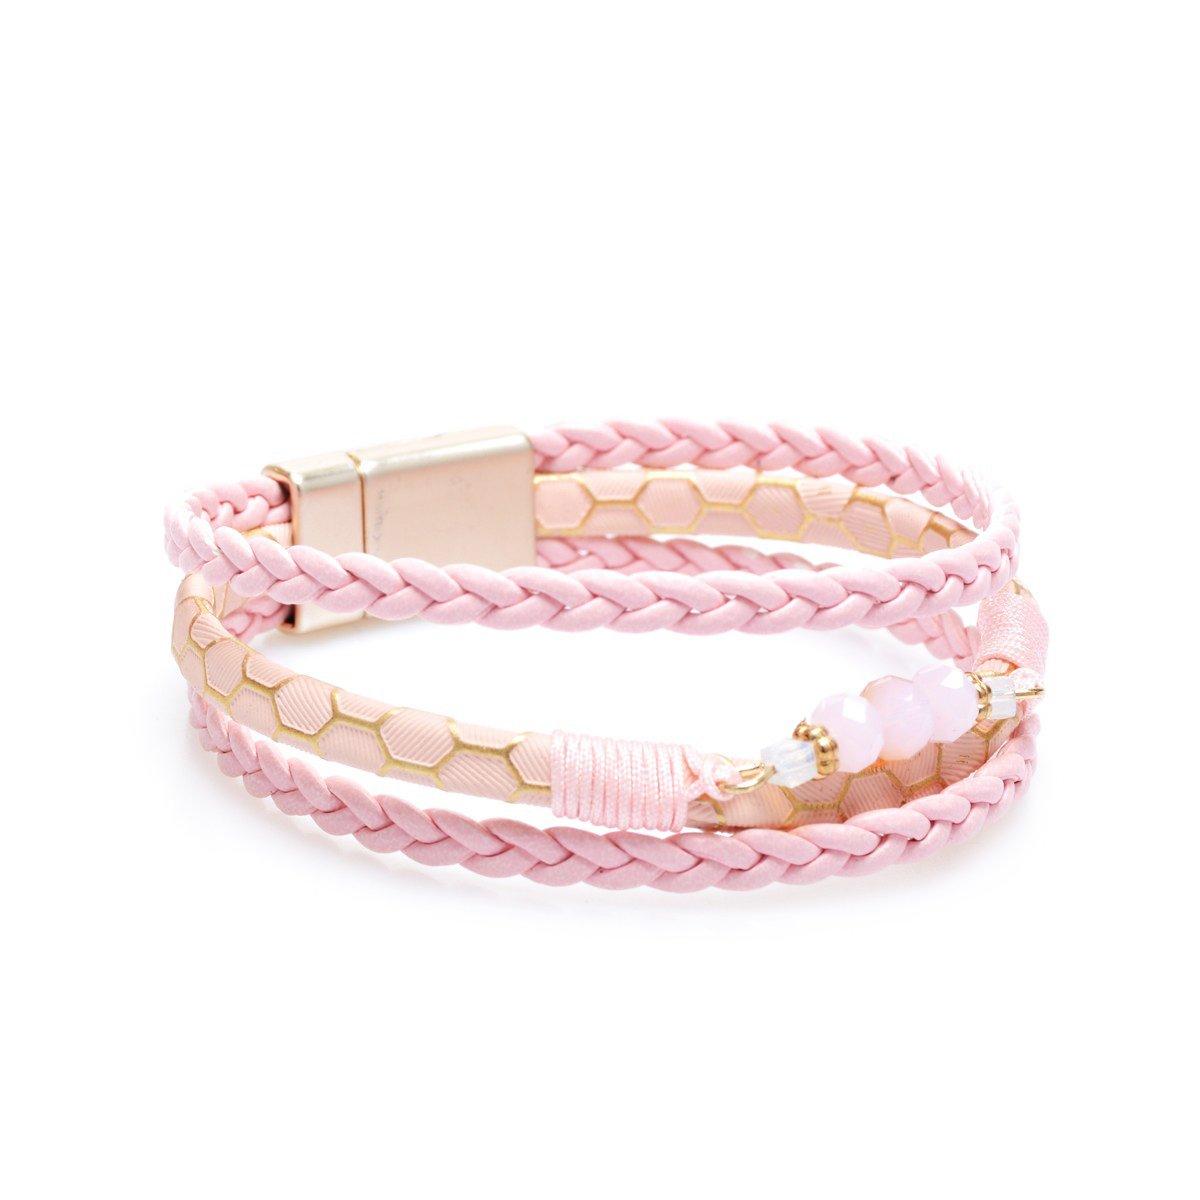 YOYOMA Leather Bracelets for Women, Magnetic Clasp Wrap Bangle Bracelet Braided Multilayer Cuff Bracelet B34